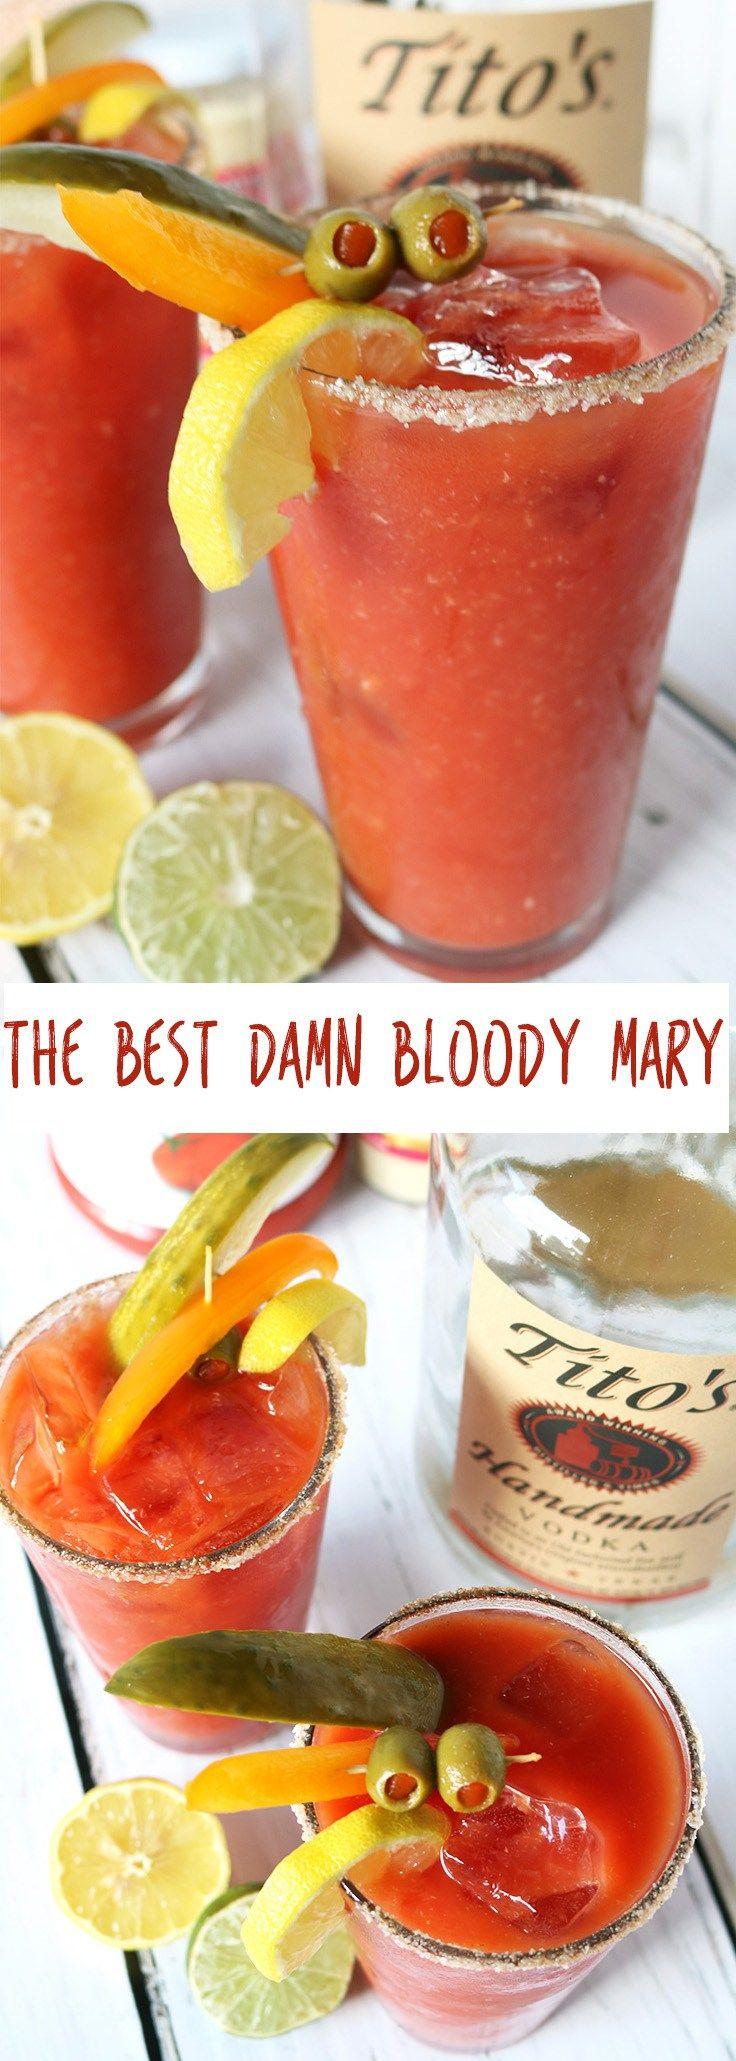 Best Damn Bloody Mary